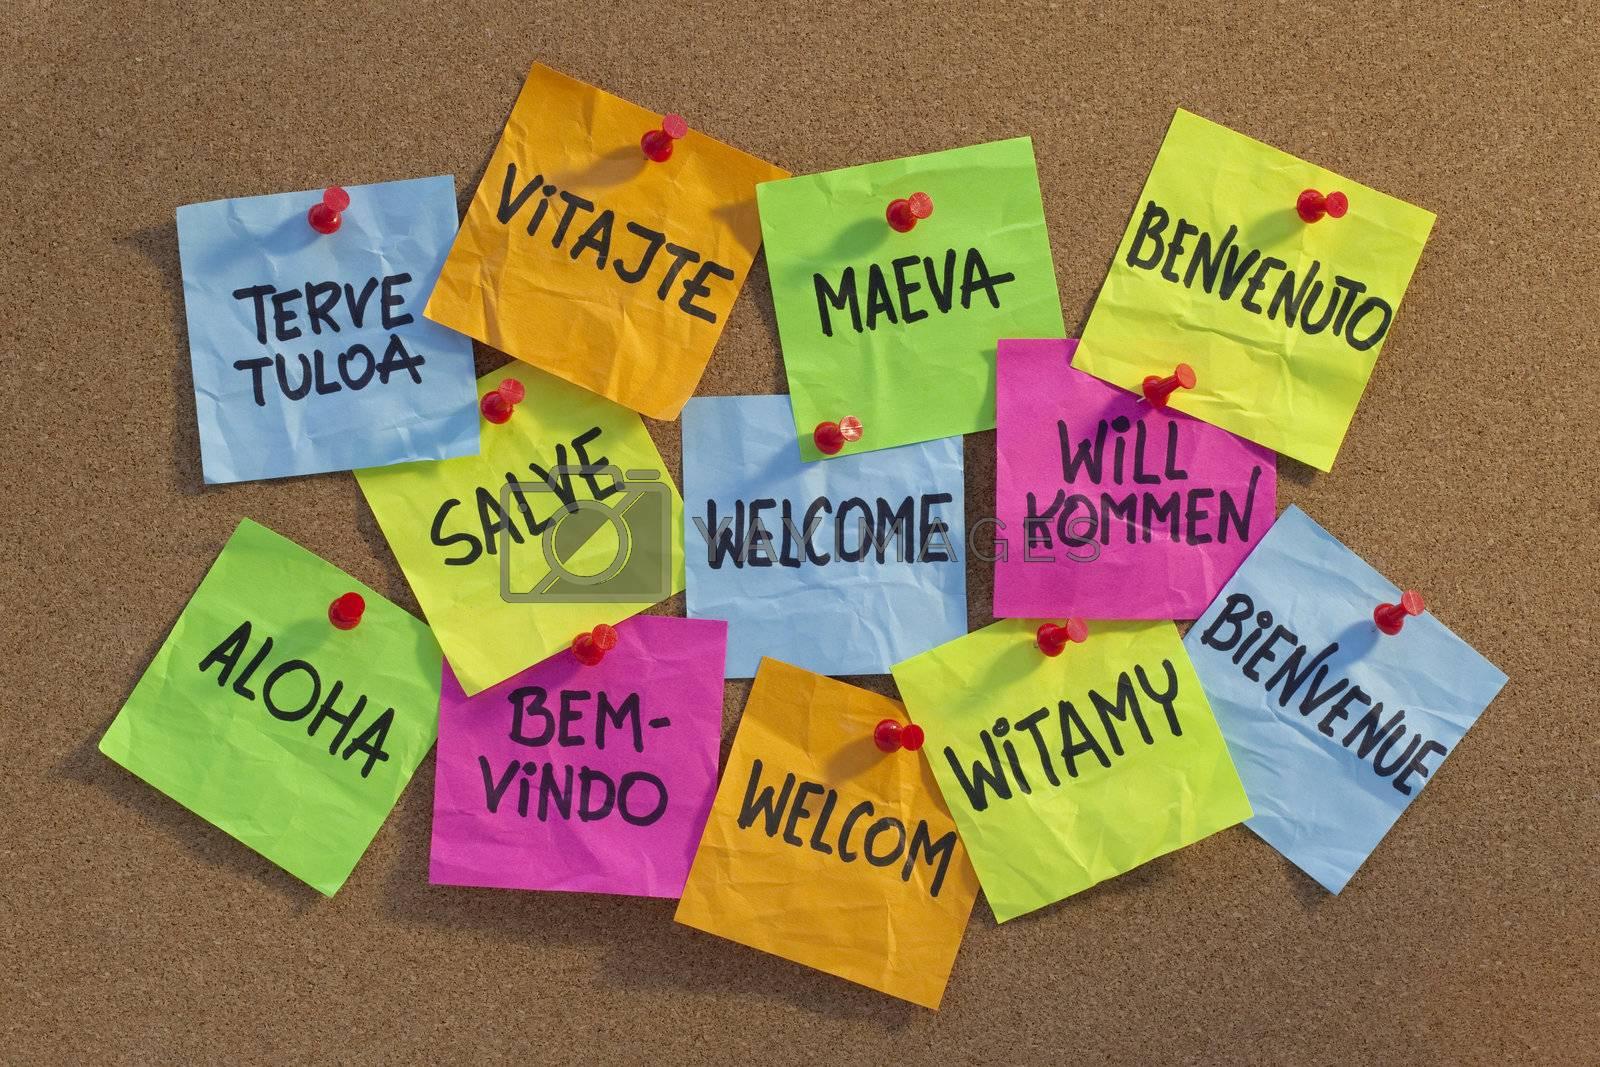 welcome, willkommen, bienvenue, aloha, ... by PixelsAway